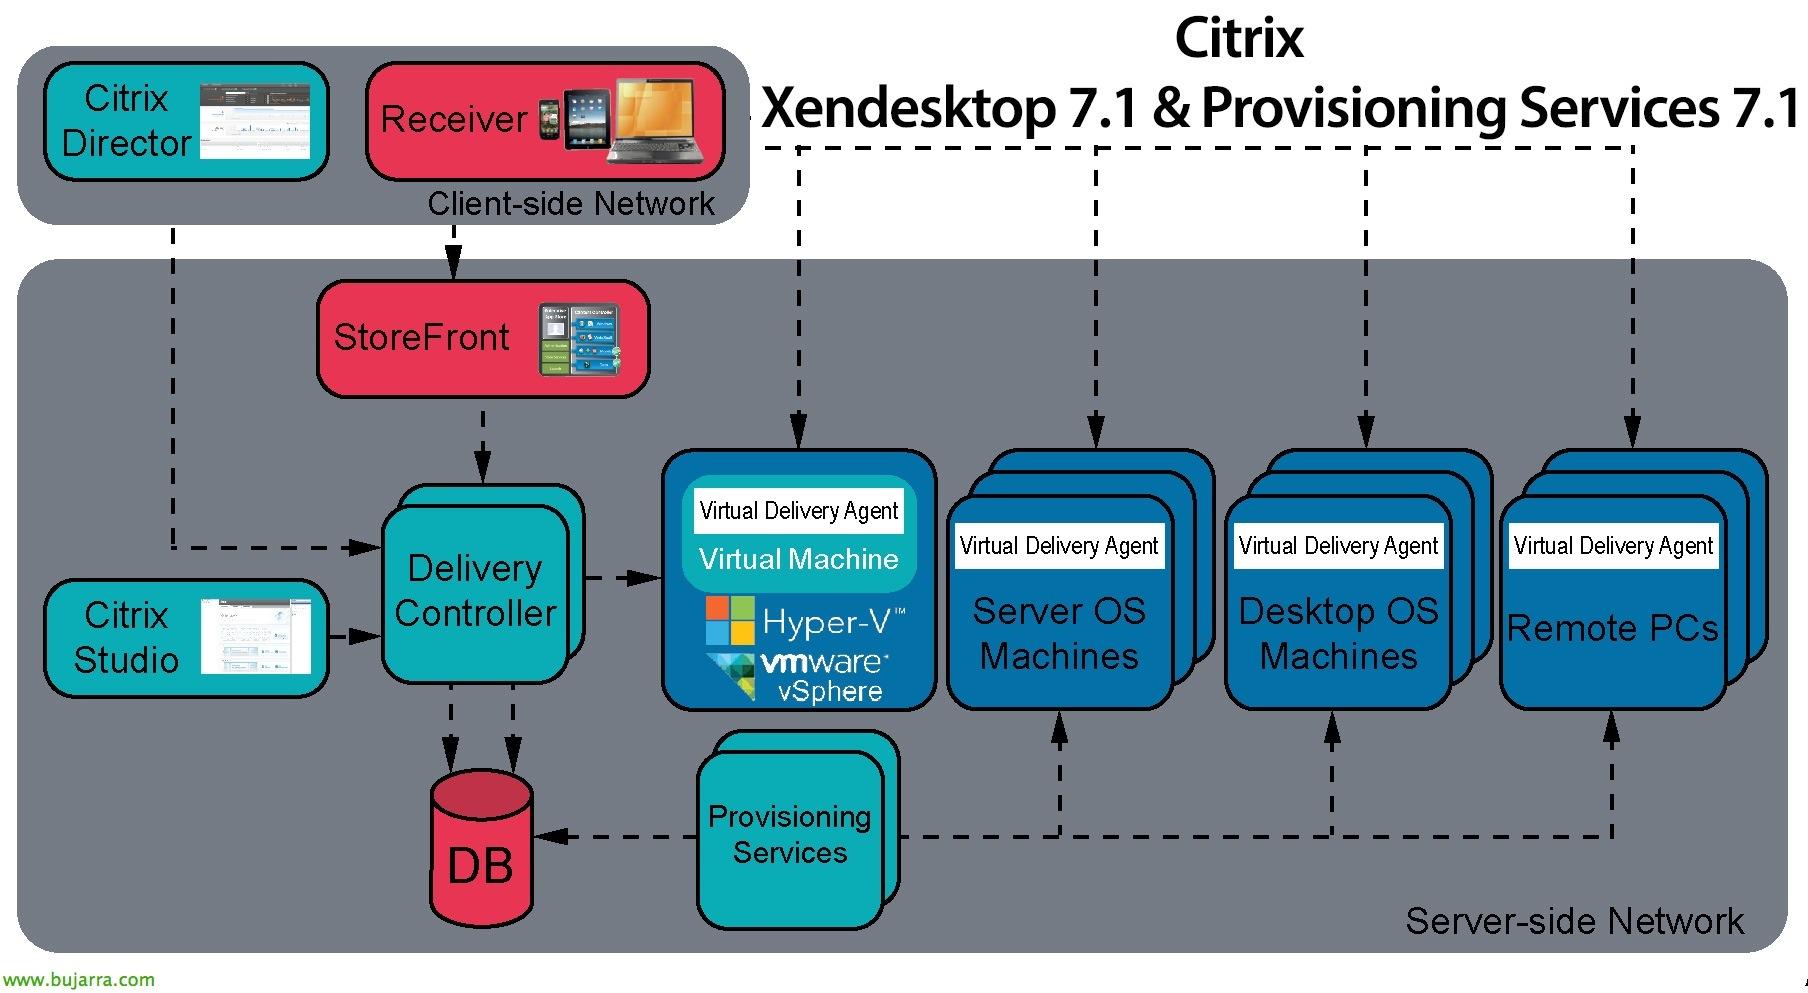 citrix-provisioning-services-xendesktop-000-bujarra